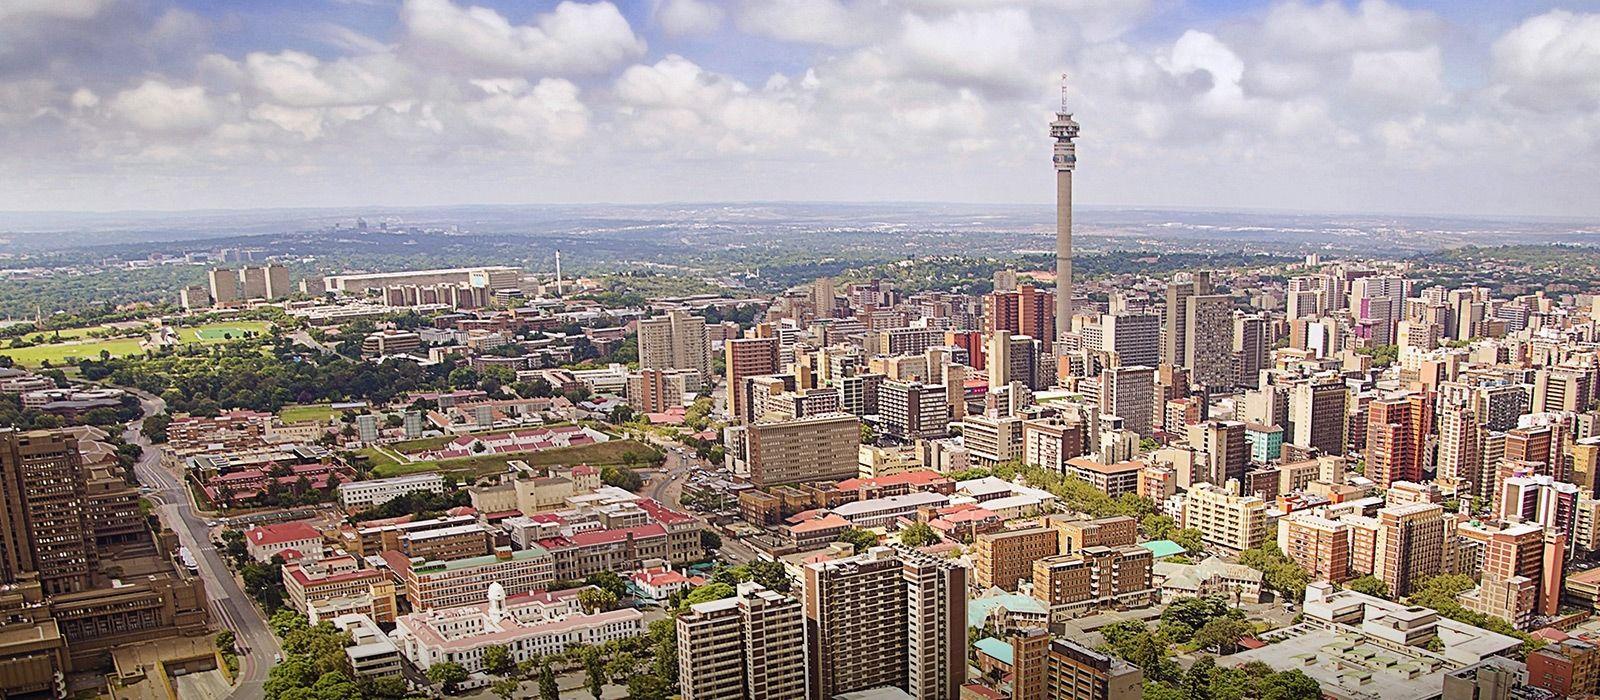 Südafrika, Sambia & Botswana: Safaris, Wein und Wasserfälle Urlaub 4